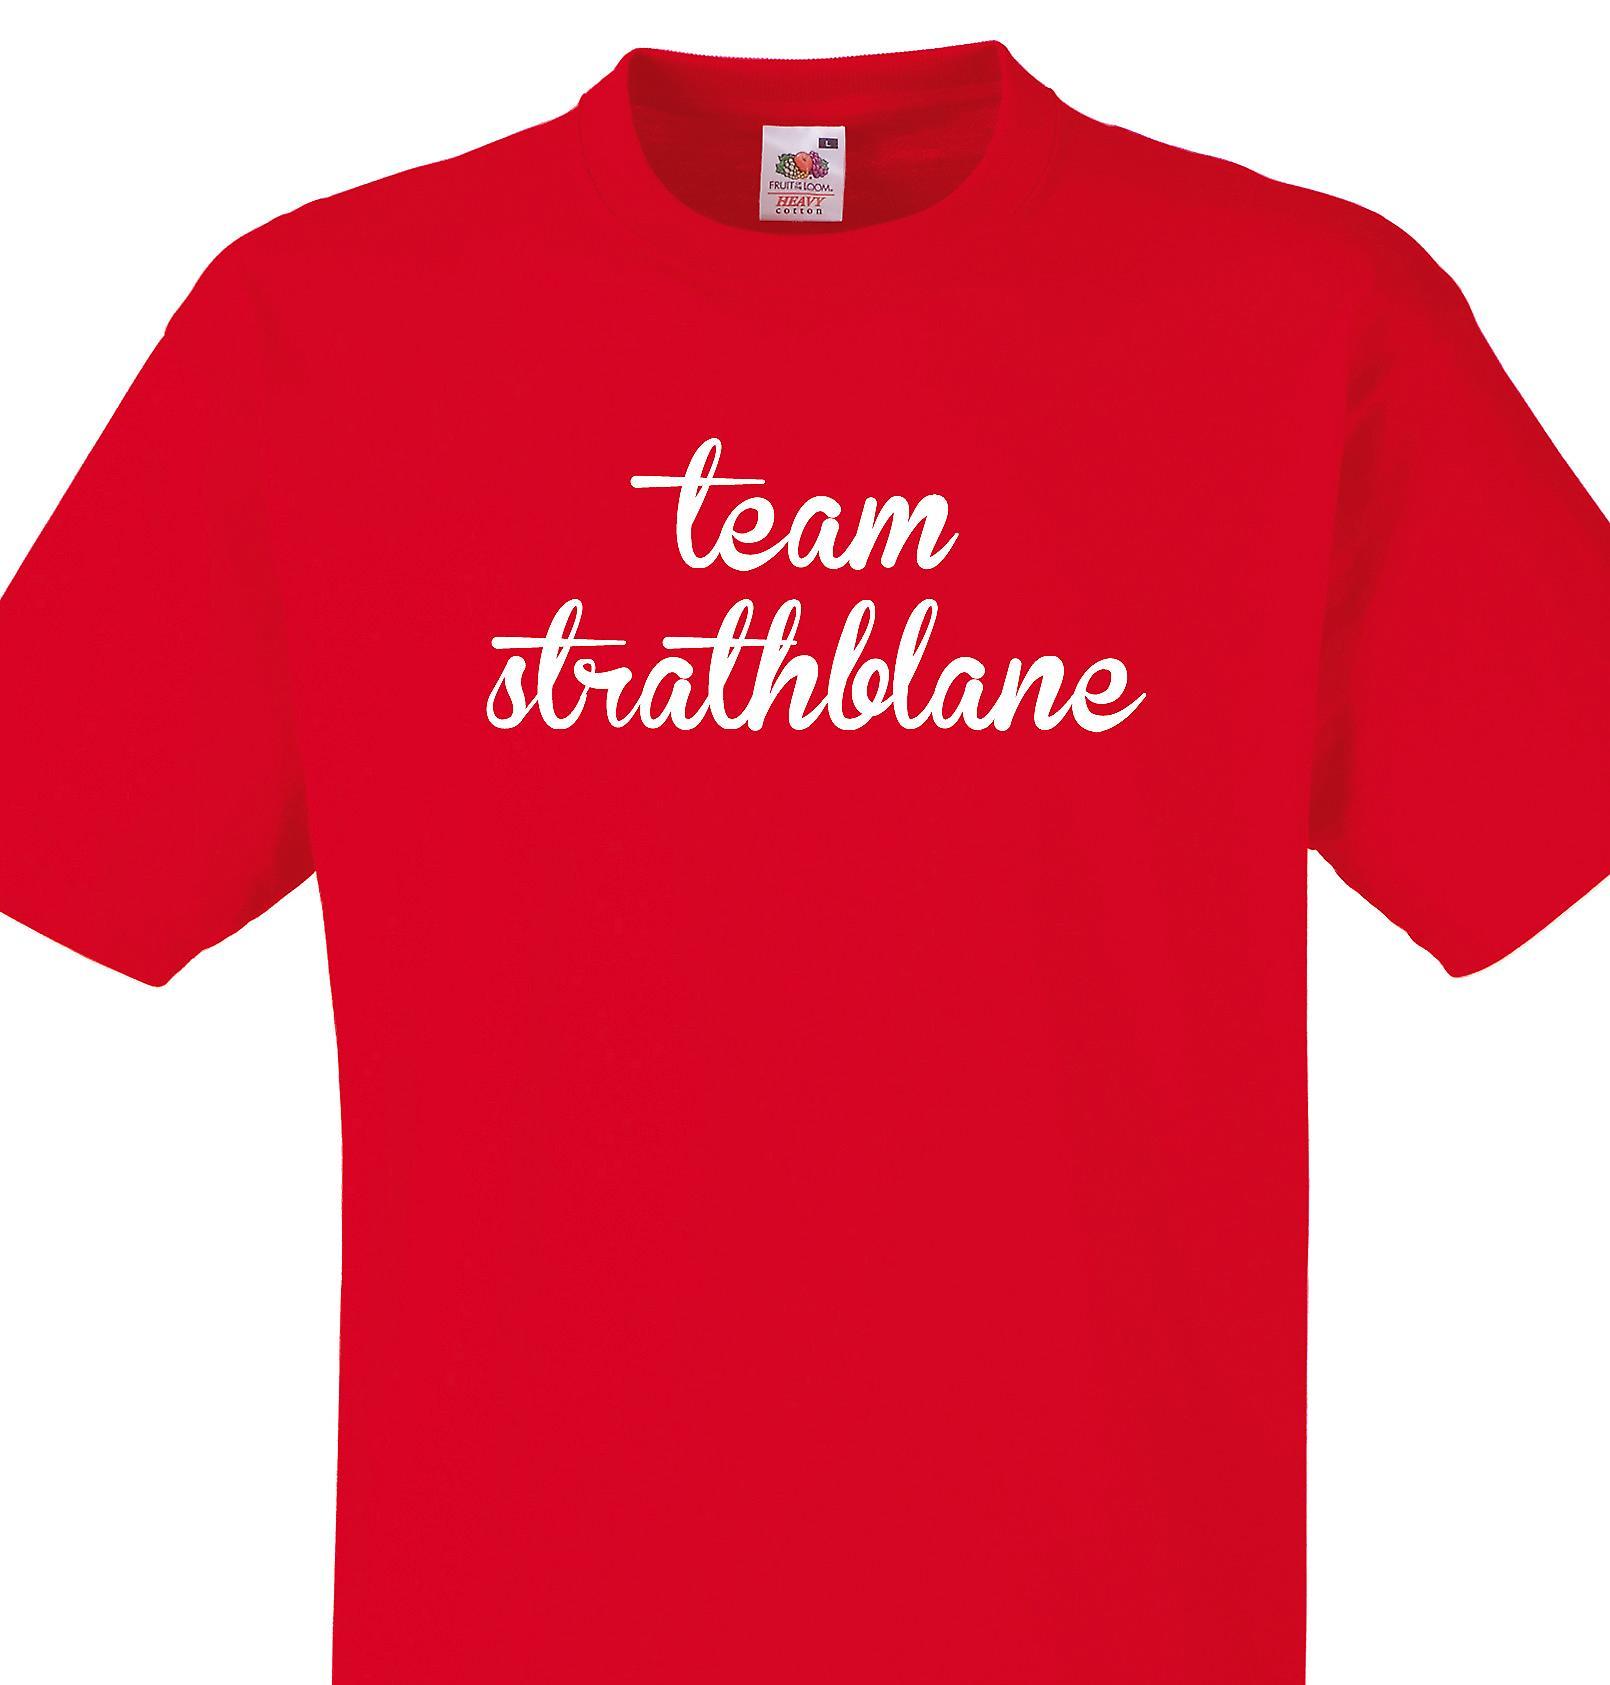 Team Strathblane Red T shirt